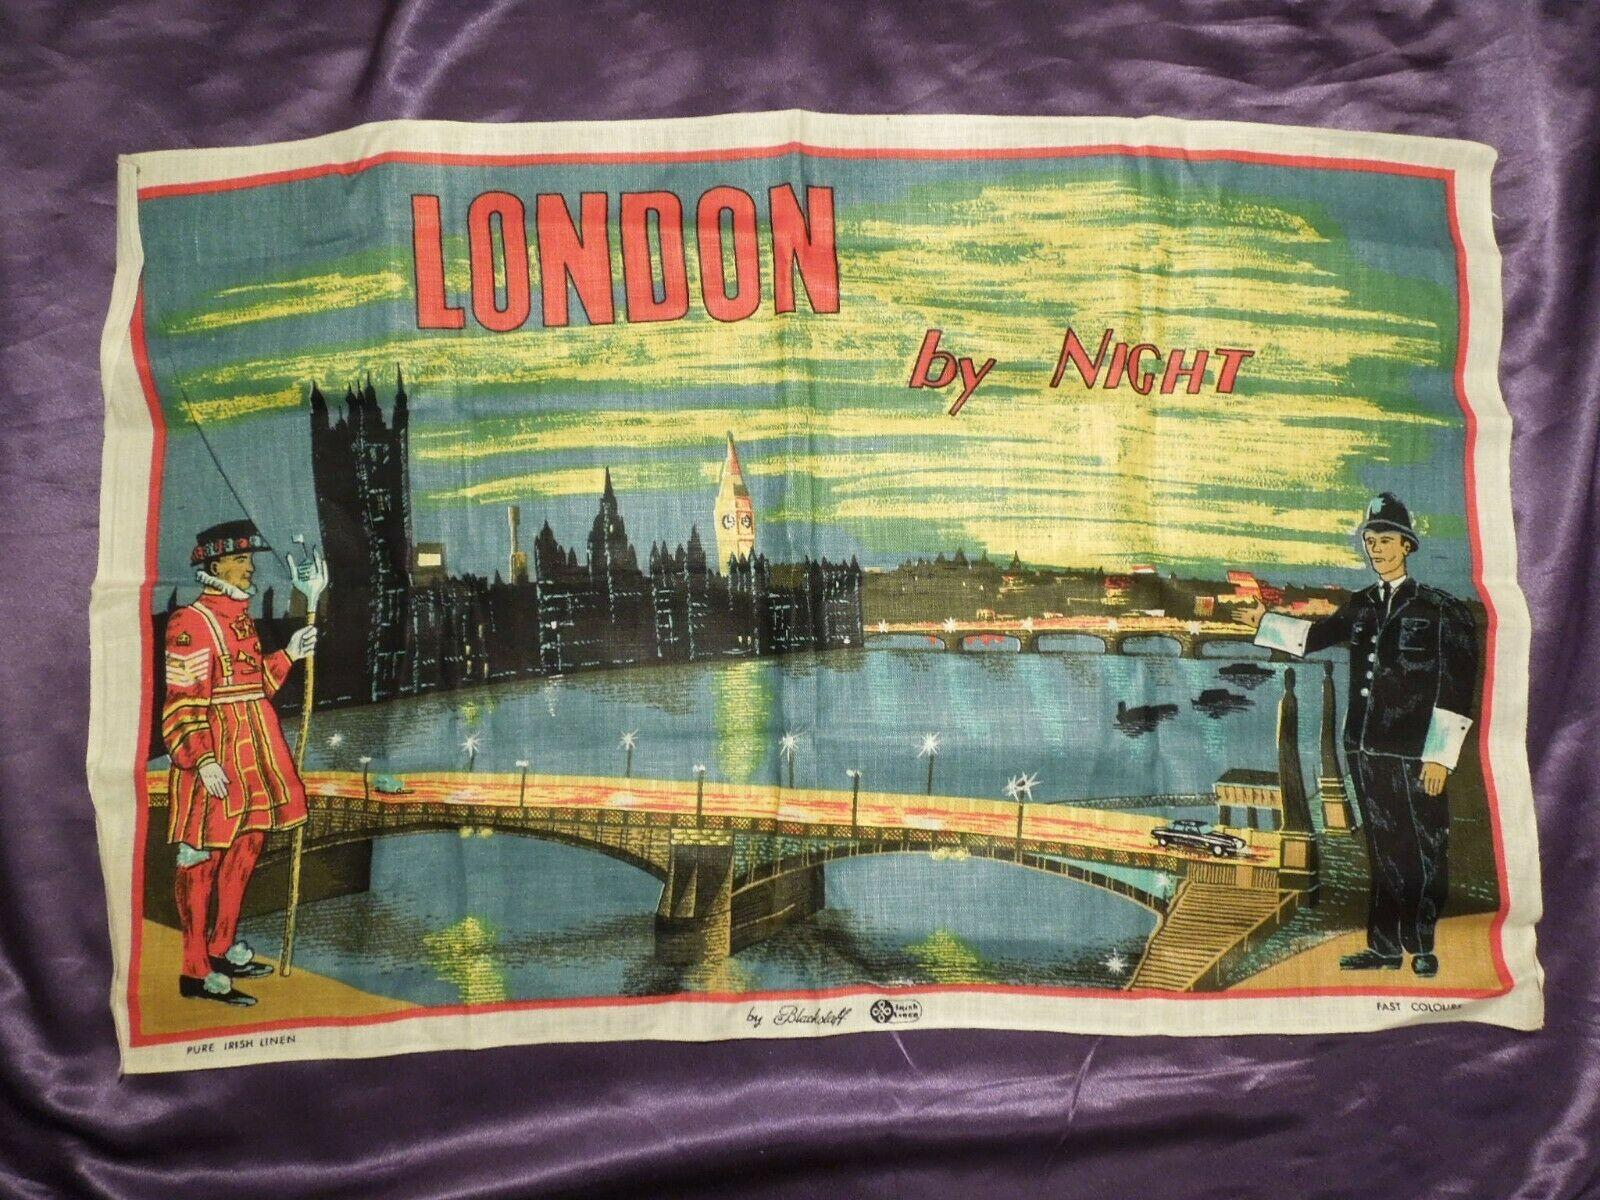 Vintage London by Night by Blackstaff Pure Irish Linen Towel Art